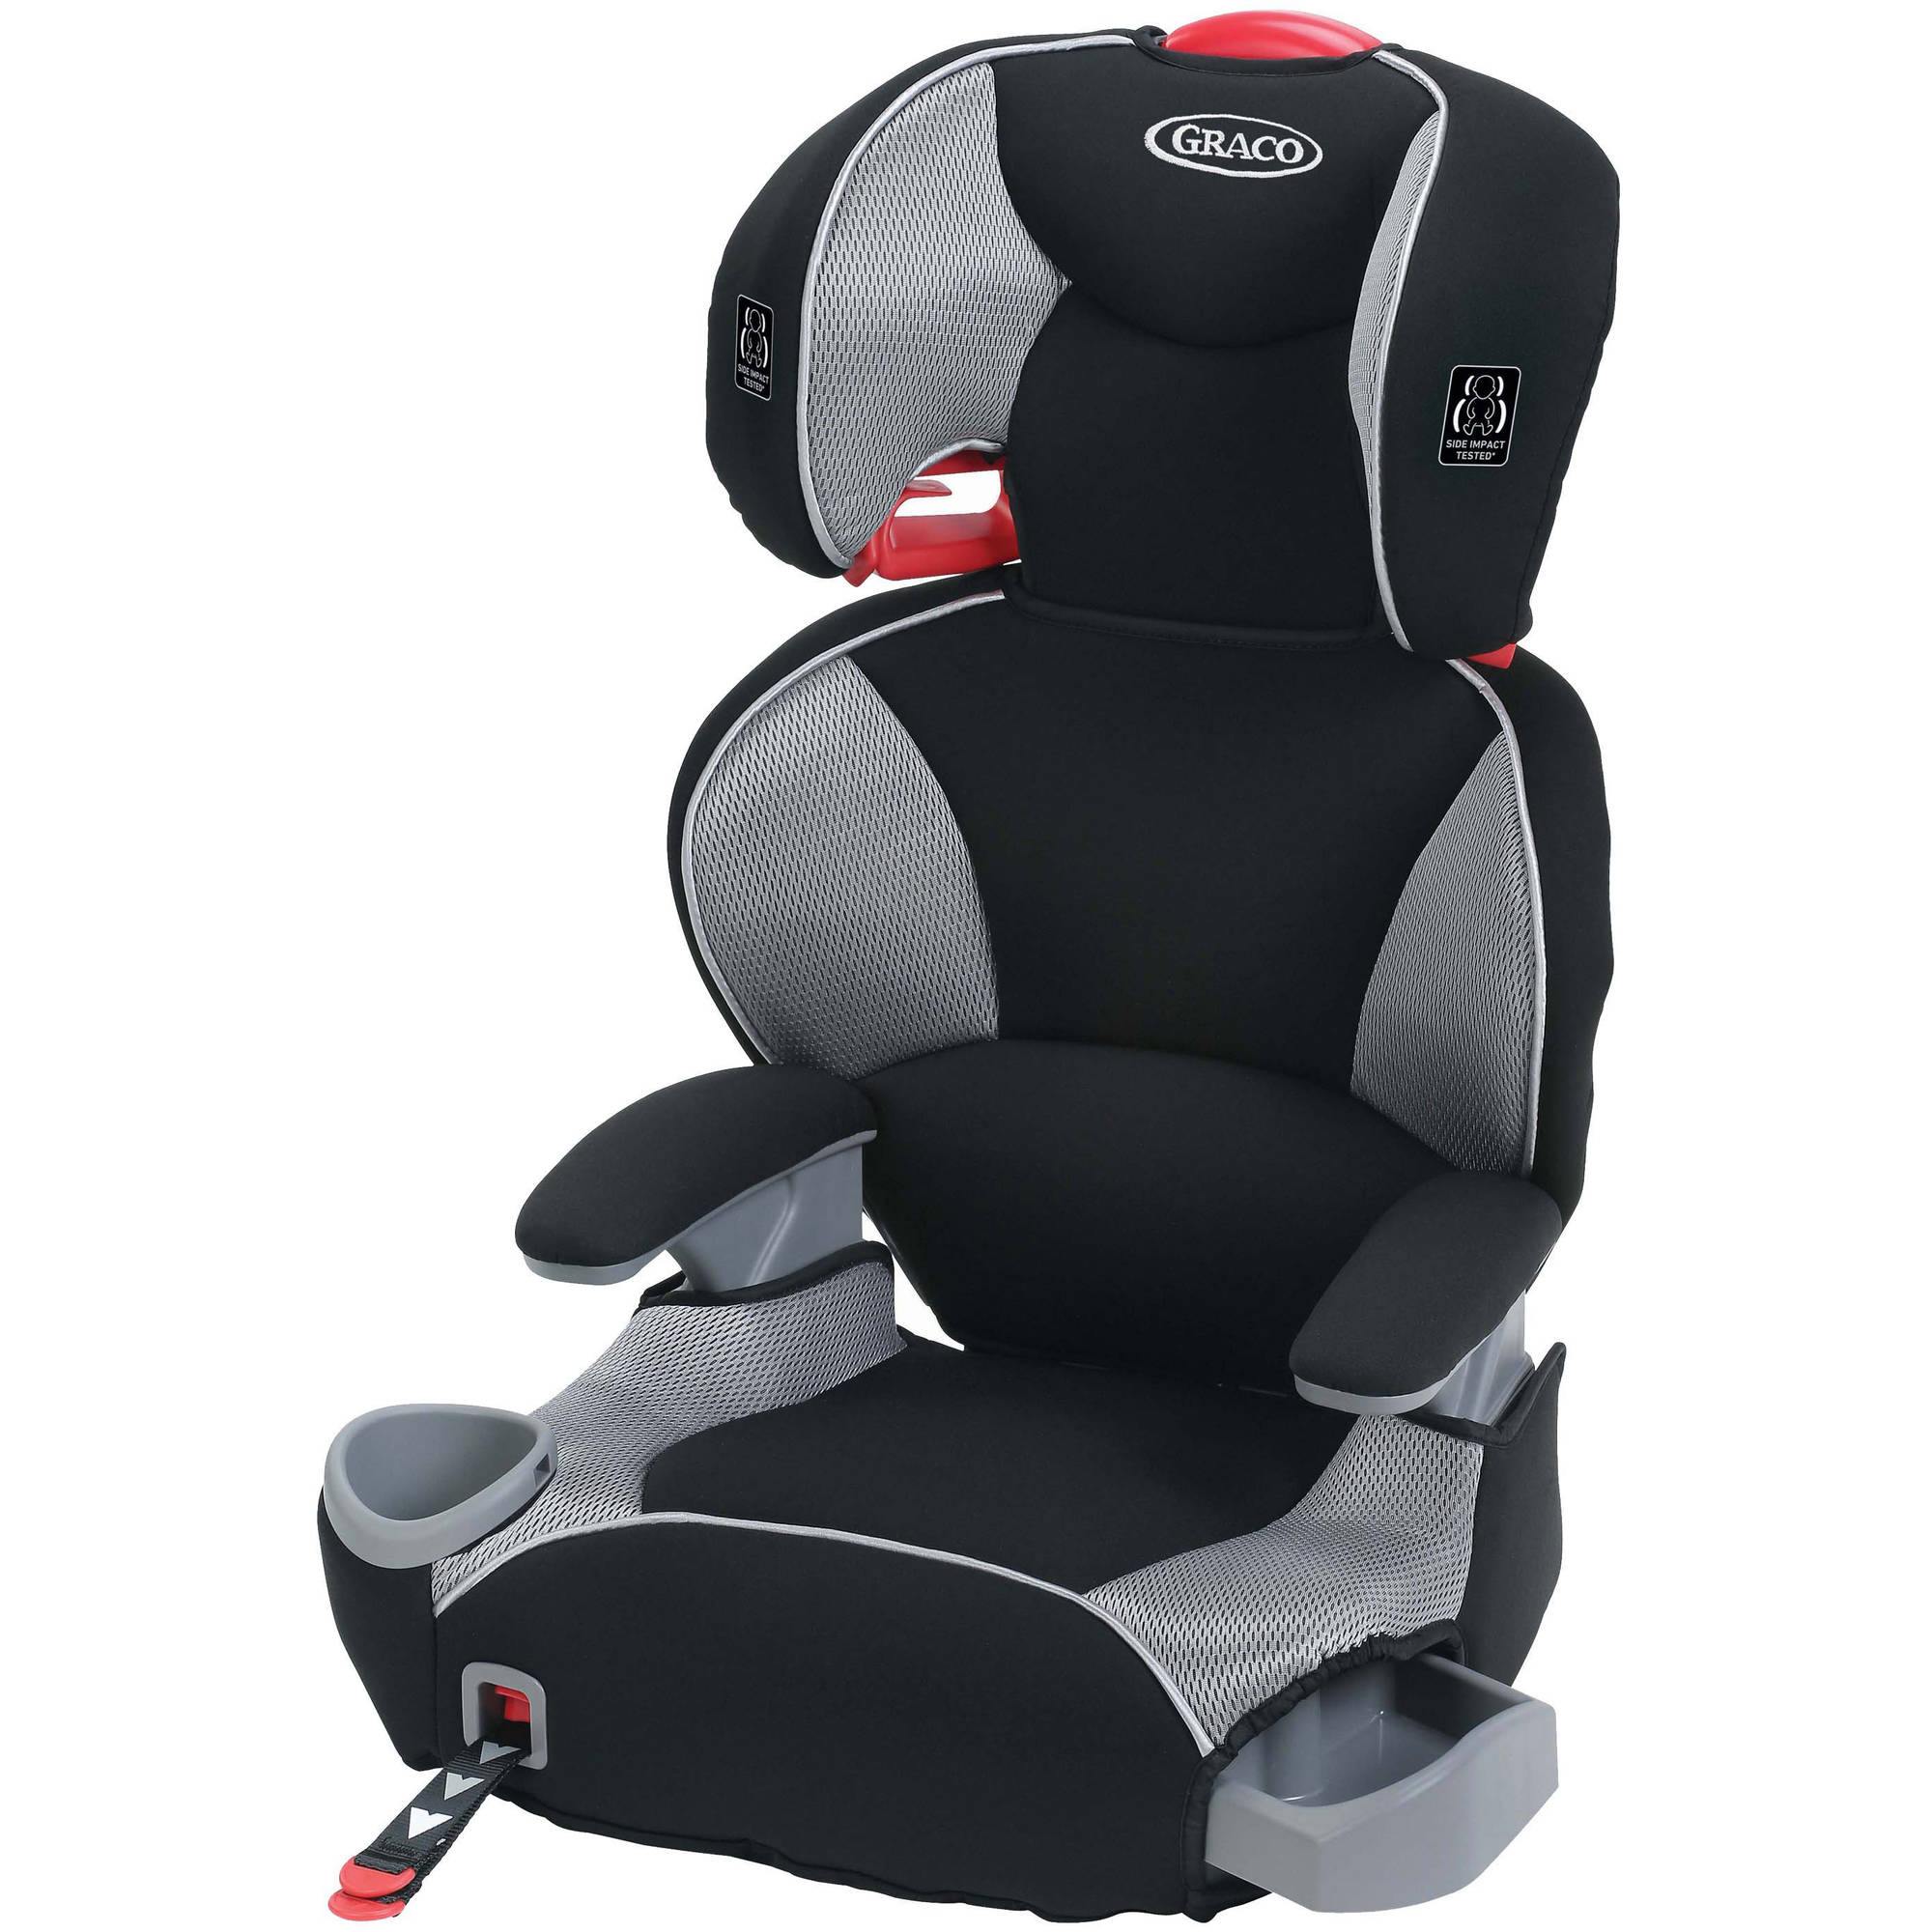 Graco AFFIX Highback TurboBooster LX Car Seat Booster Seat, Matrix